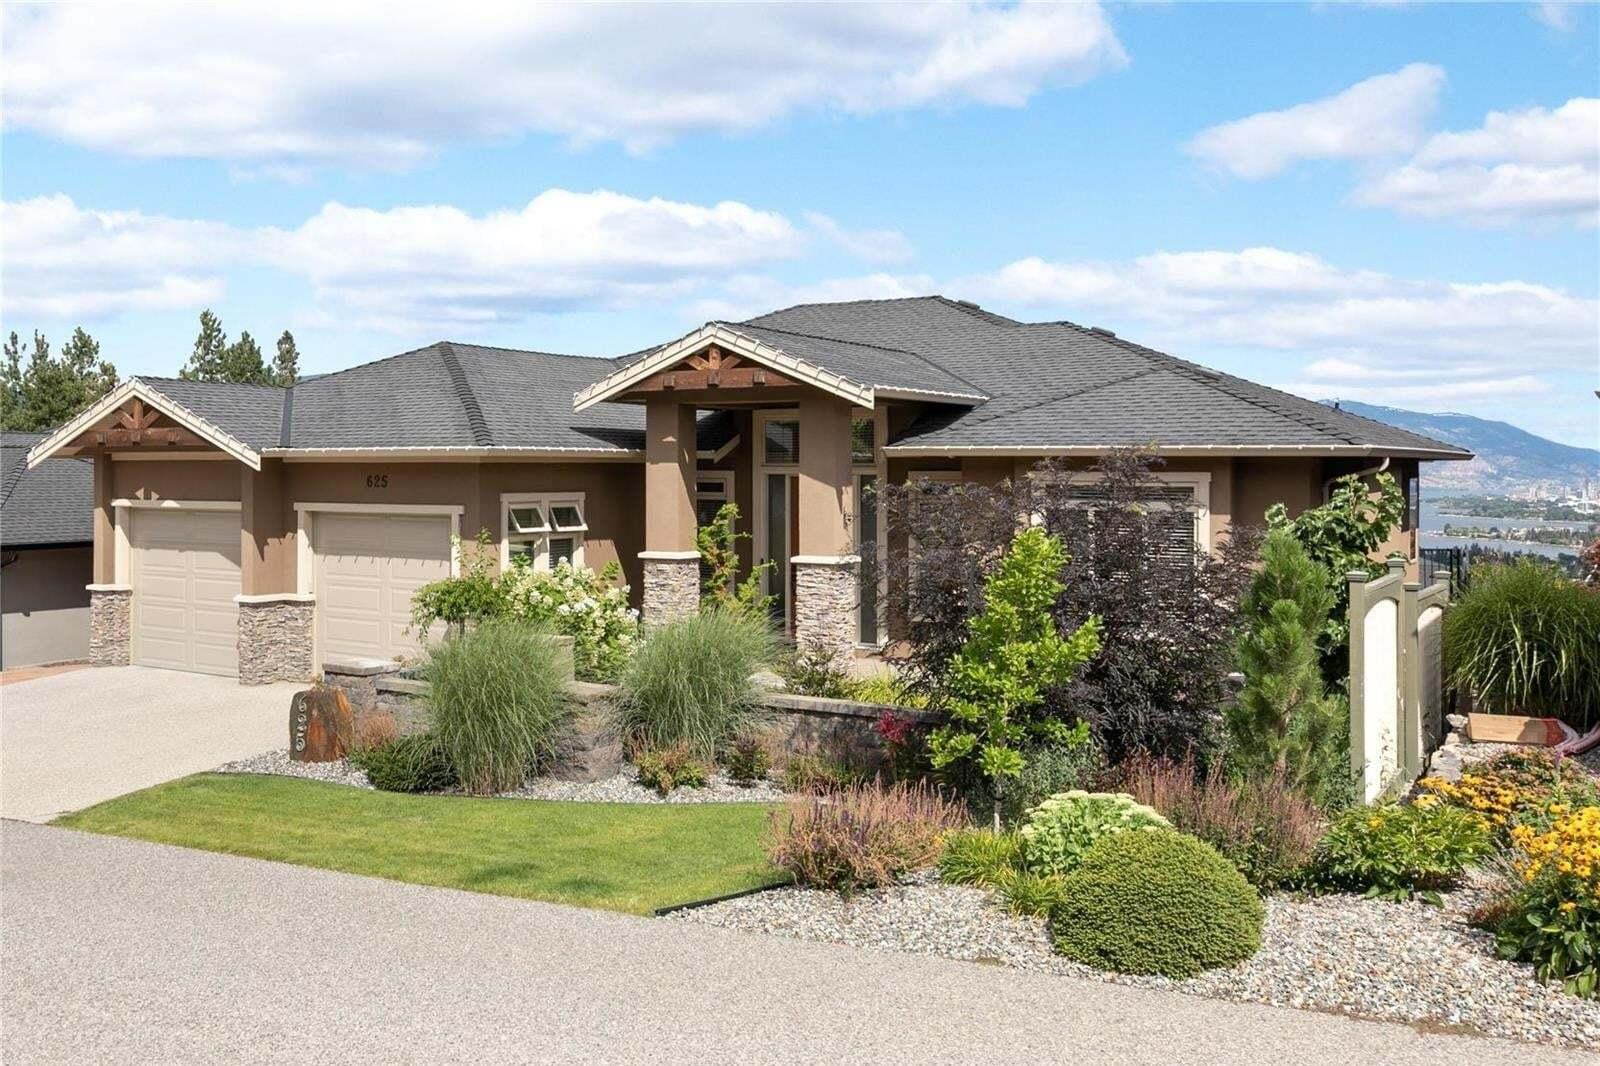 House for sale at 625 Devonian Ave Kelowna British Columbia - MLS: 10213217